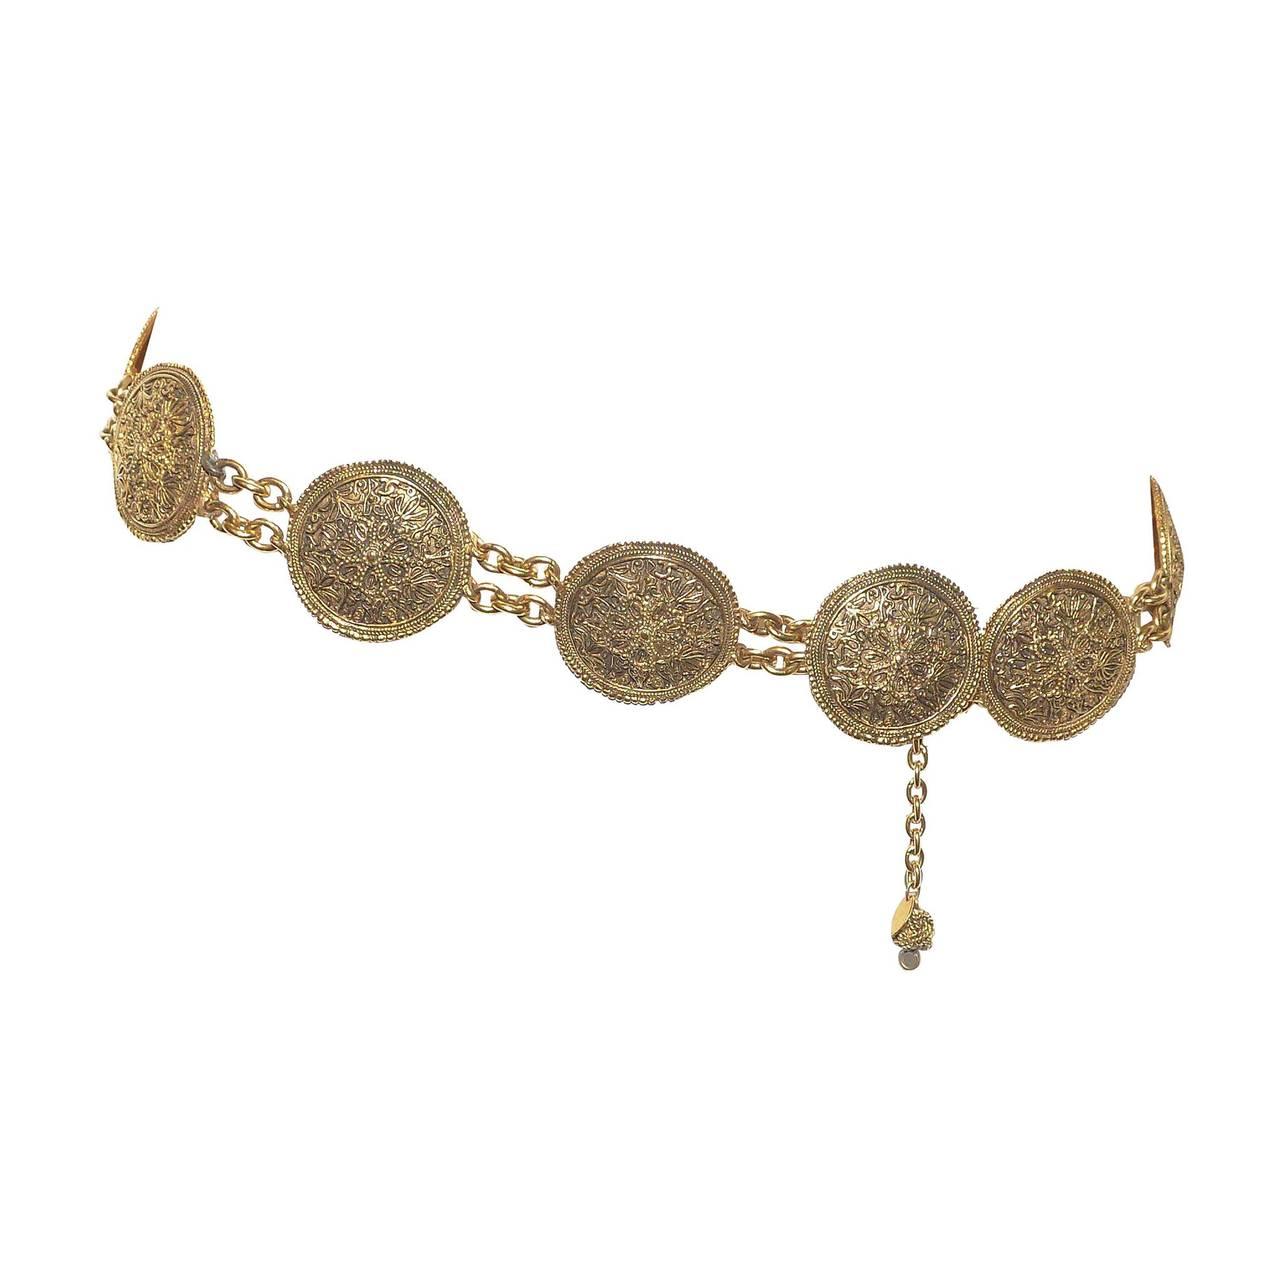 Chanel 1985 Baroque Medallion Chain Belt